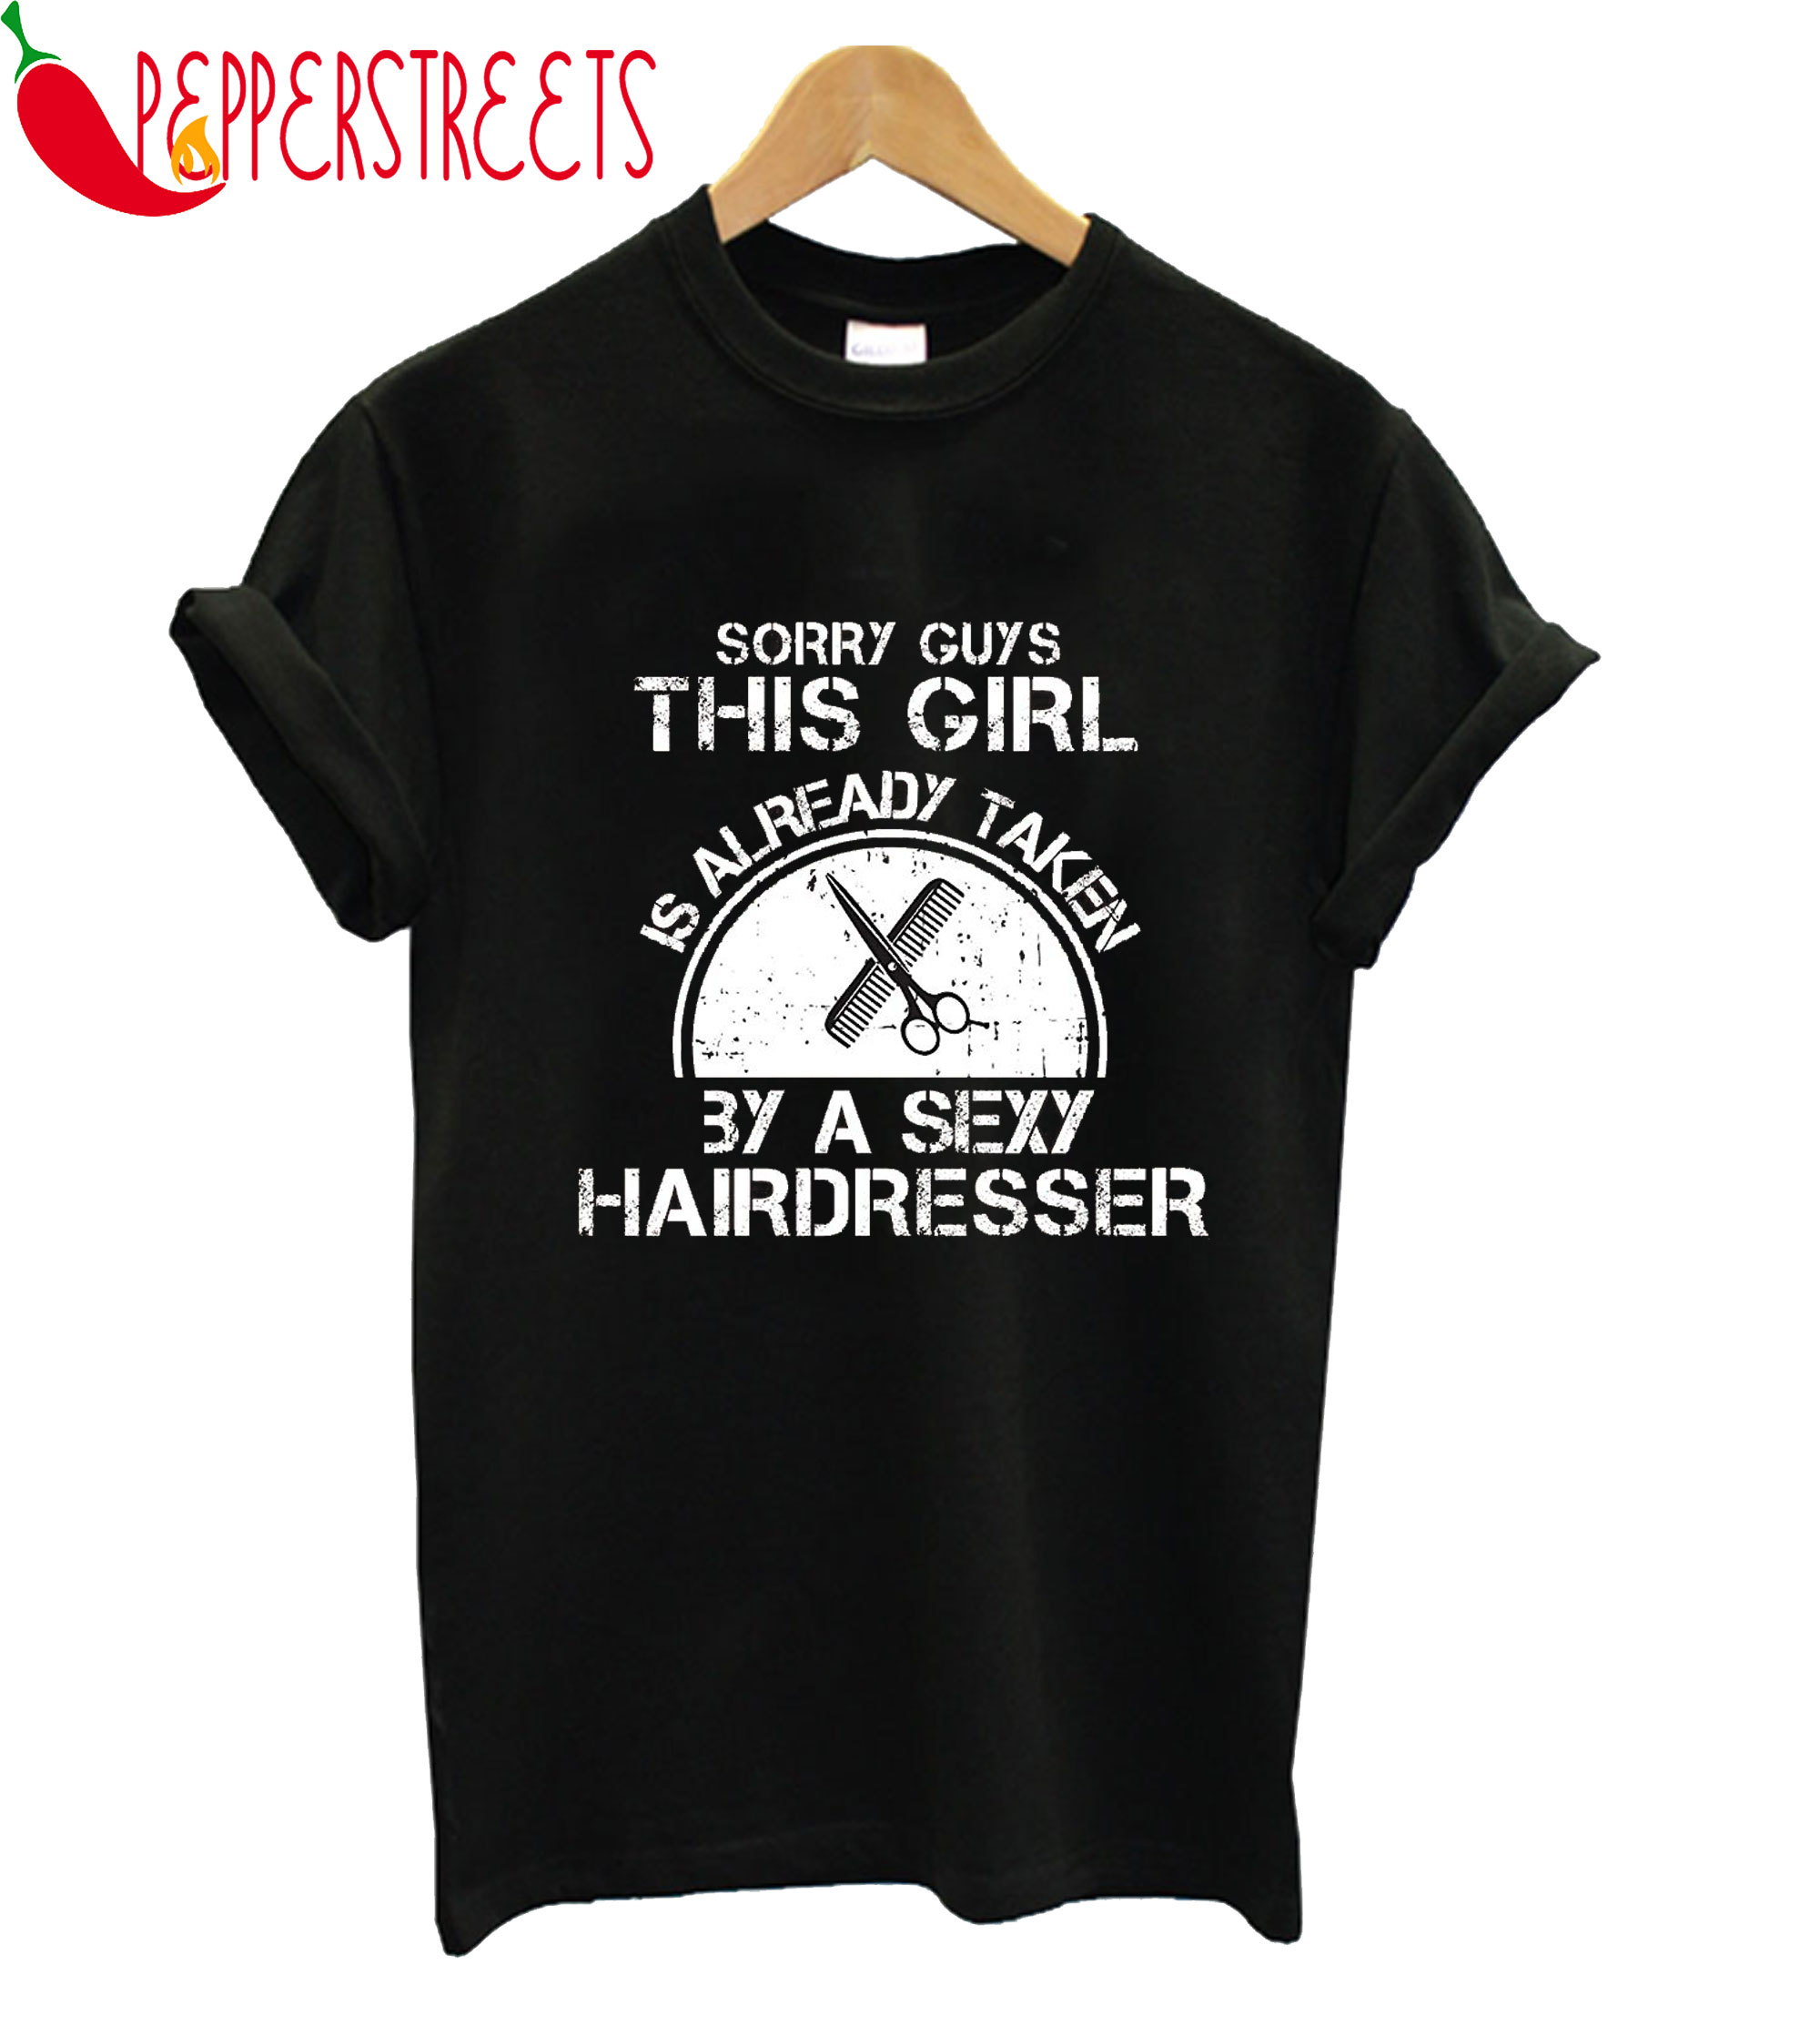 This Girl T-Shirt